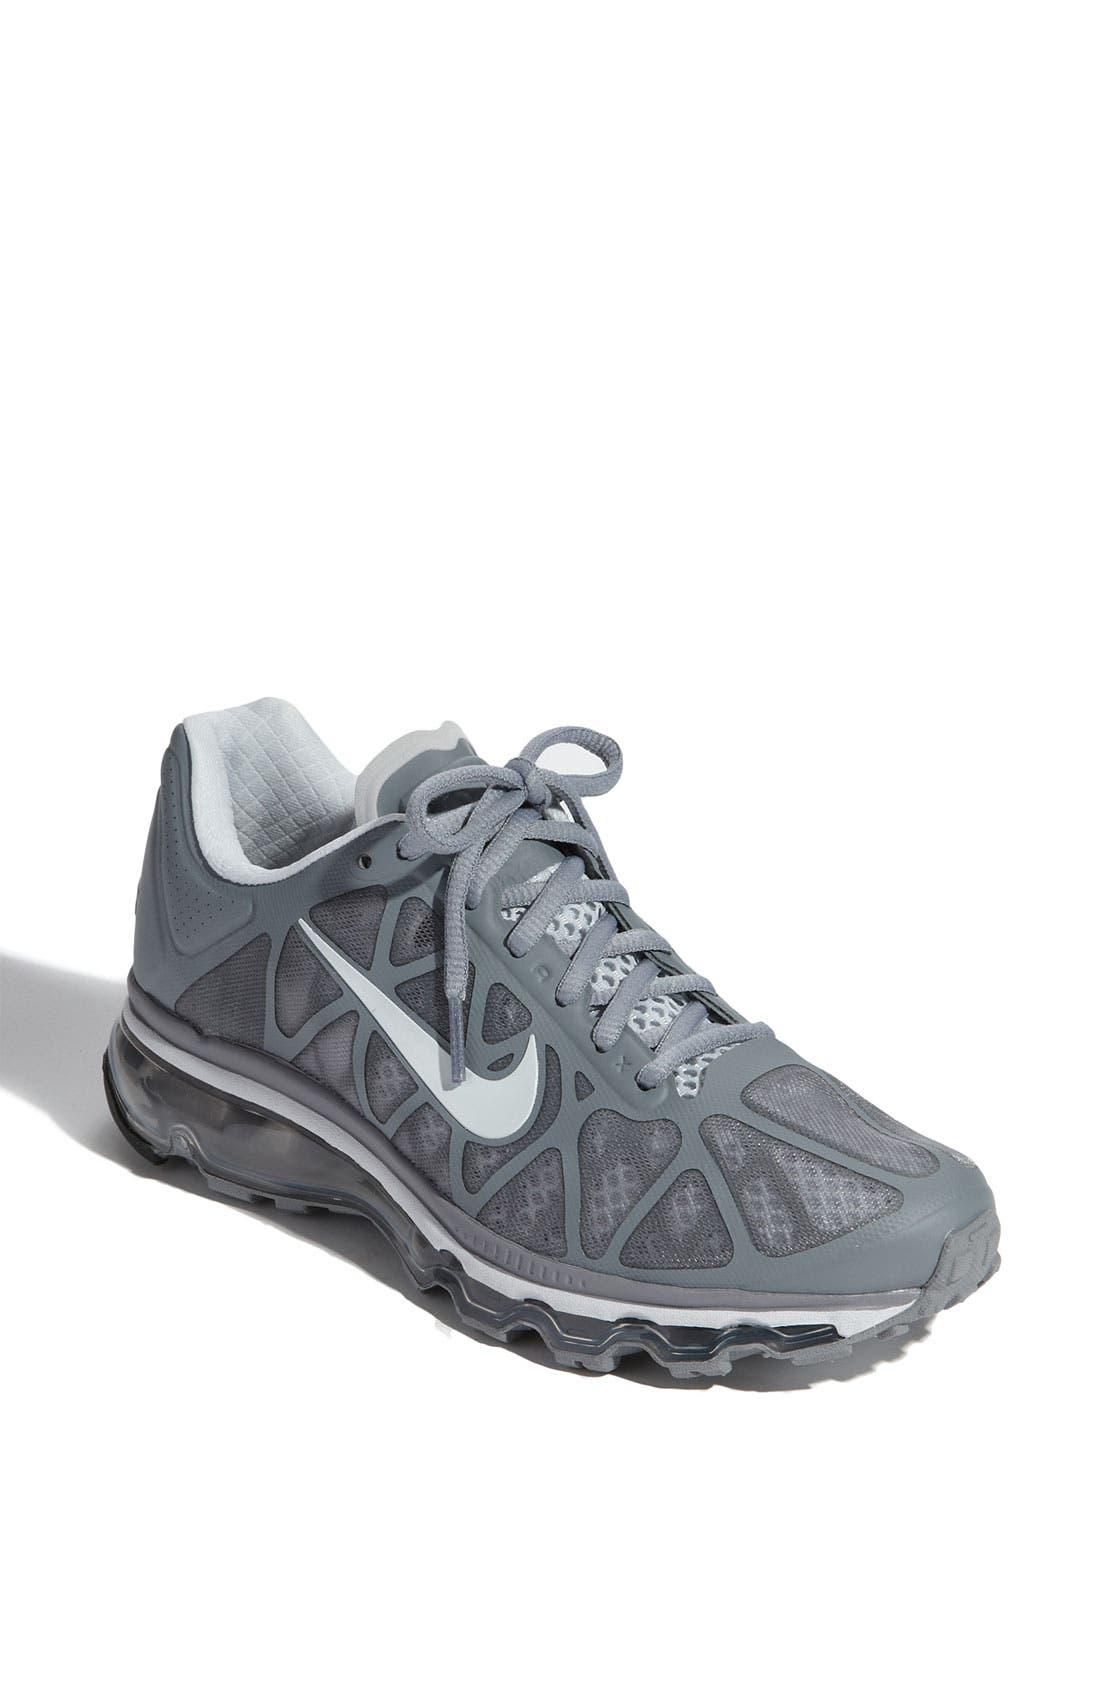 Main Image - Nike 'Air Max+ 2011' Running Shoe (Women)